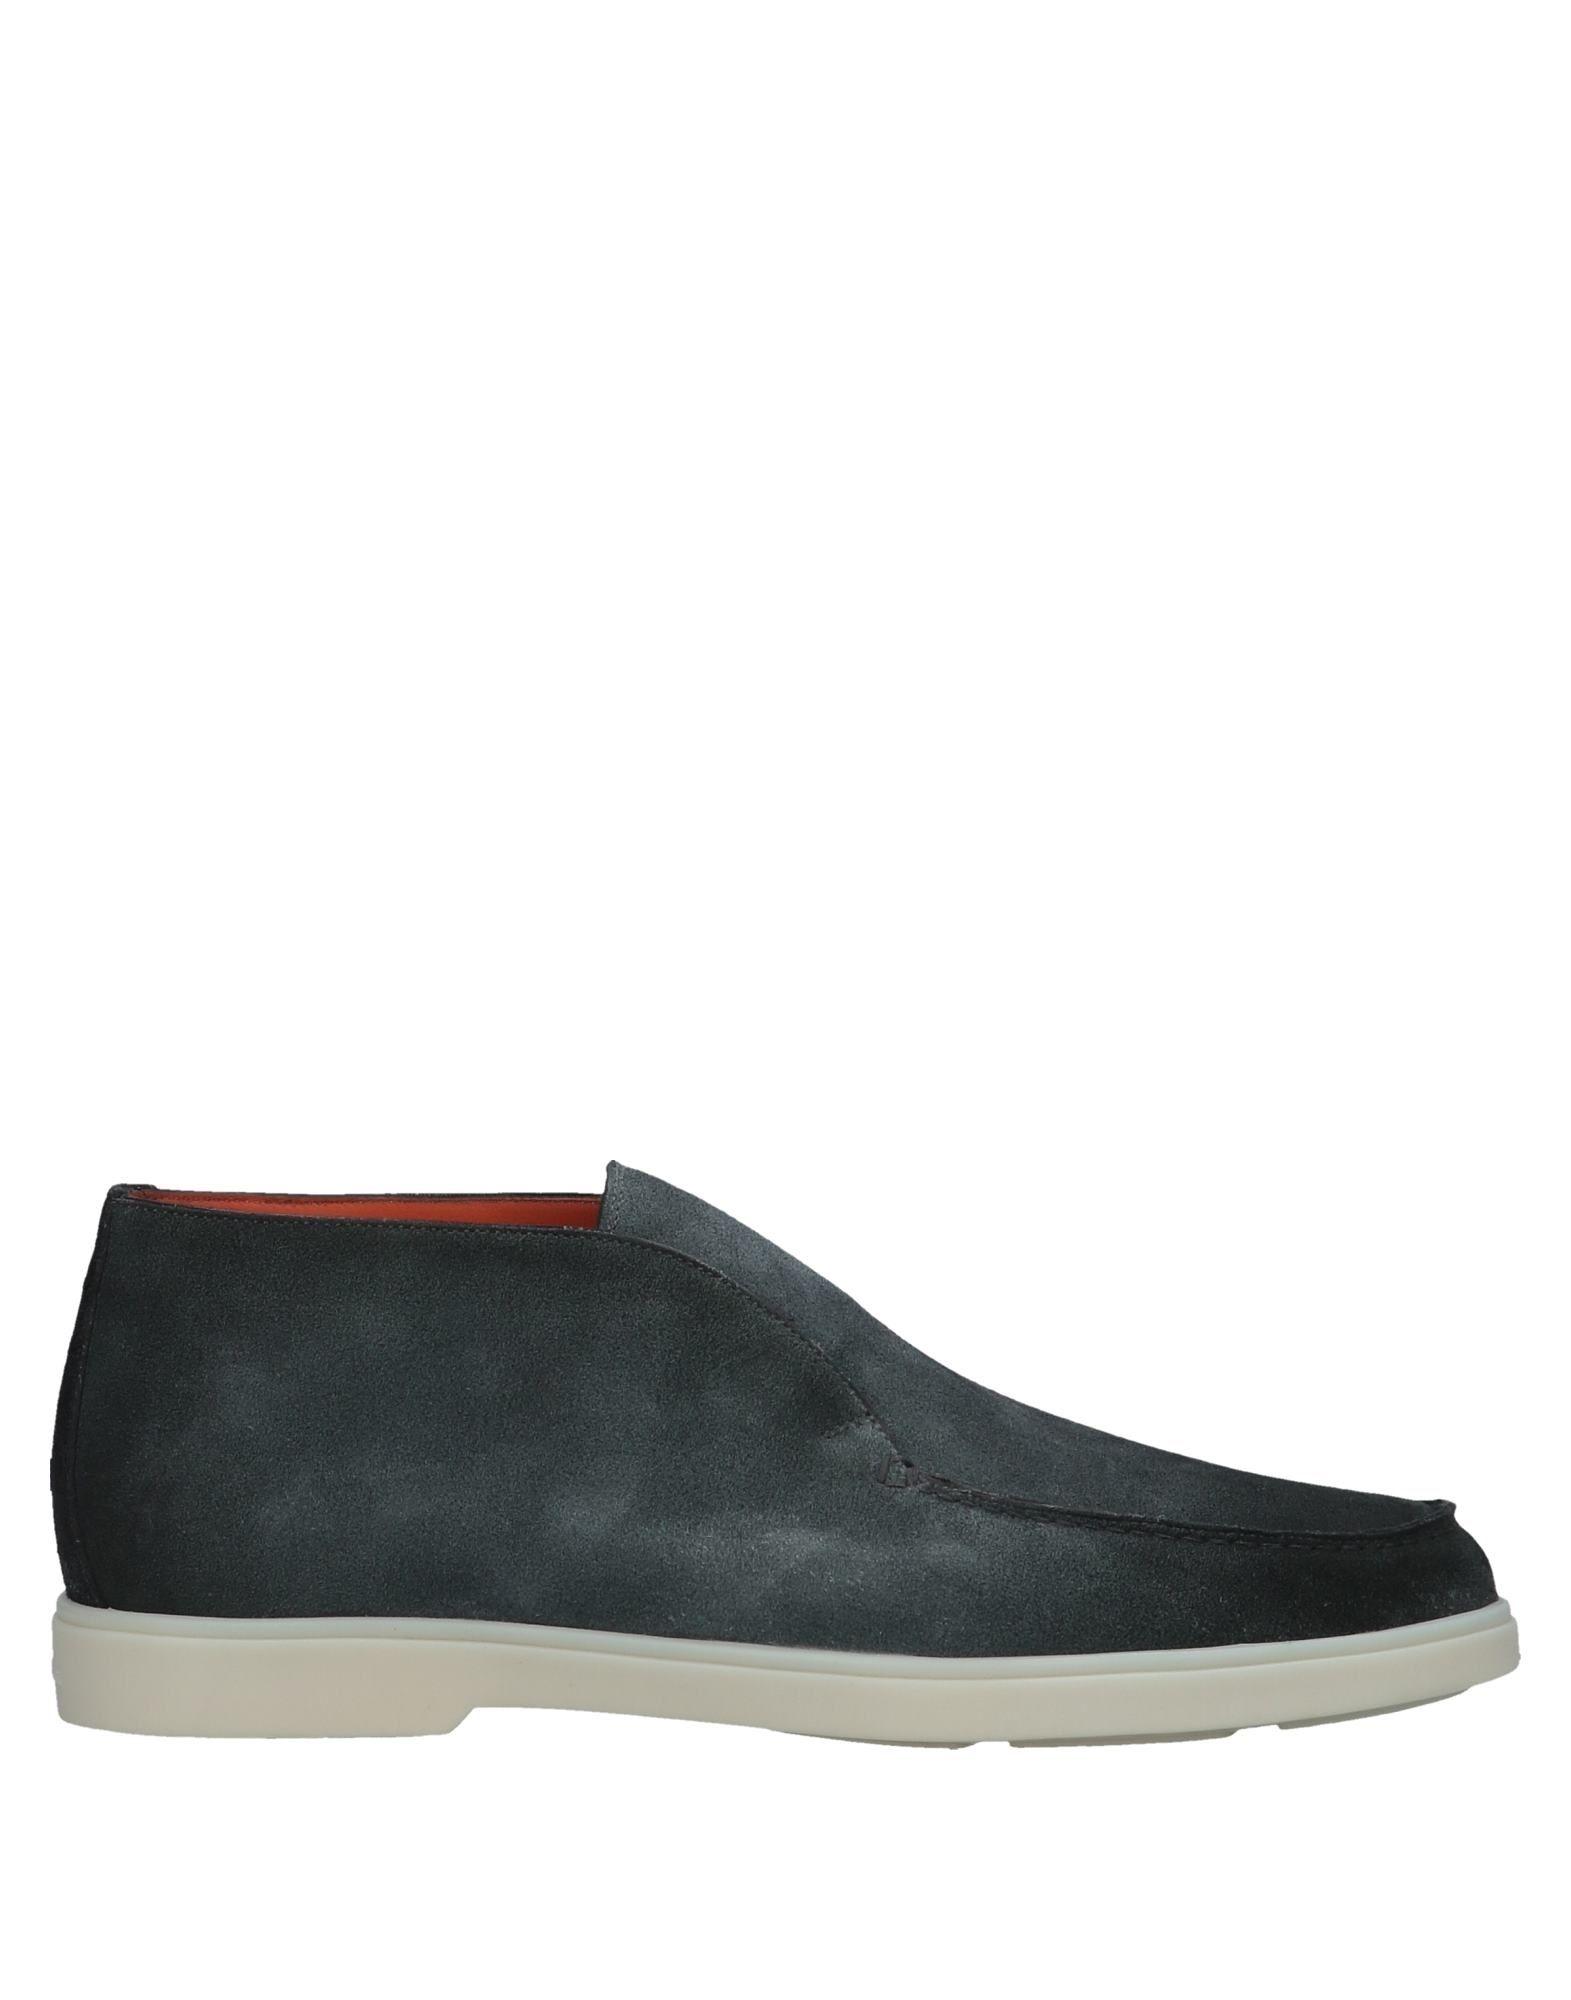 Santoni Mokassins Qualität Herren  11541513SO Gute Qualität Mokassins beliebte Schuhe 7de86f